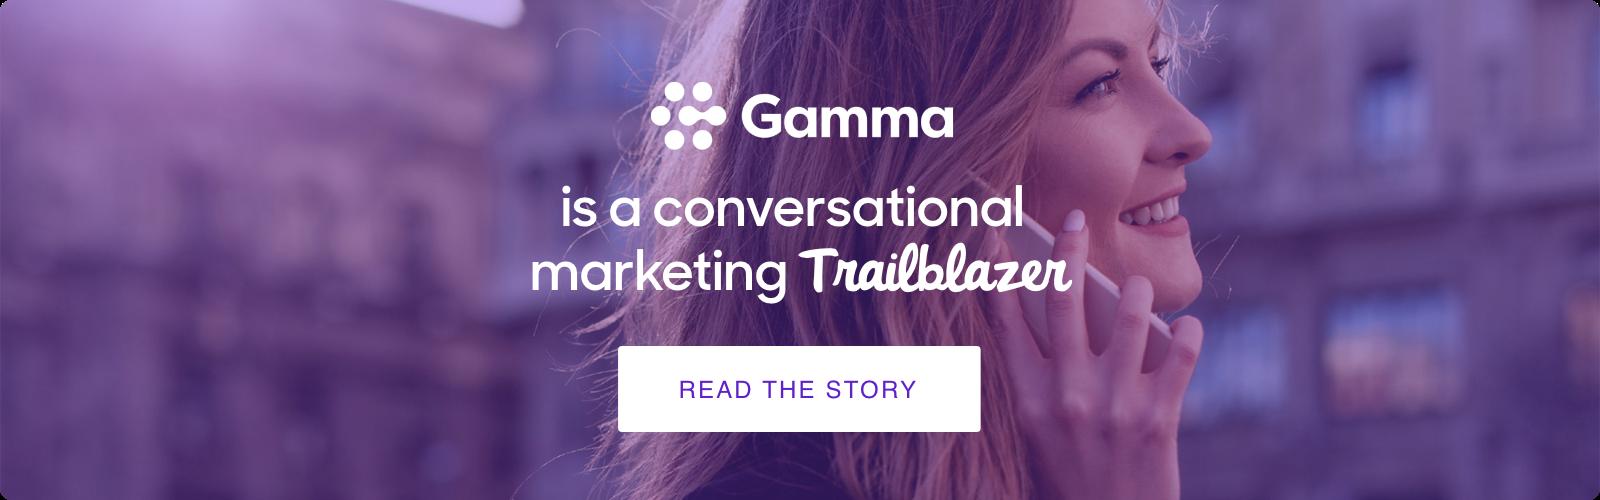 Gamma is a Conversational Marketing Trailblazer